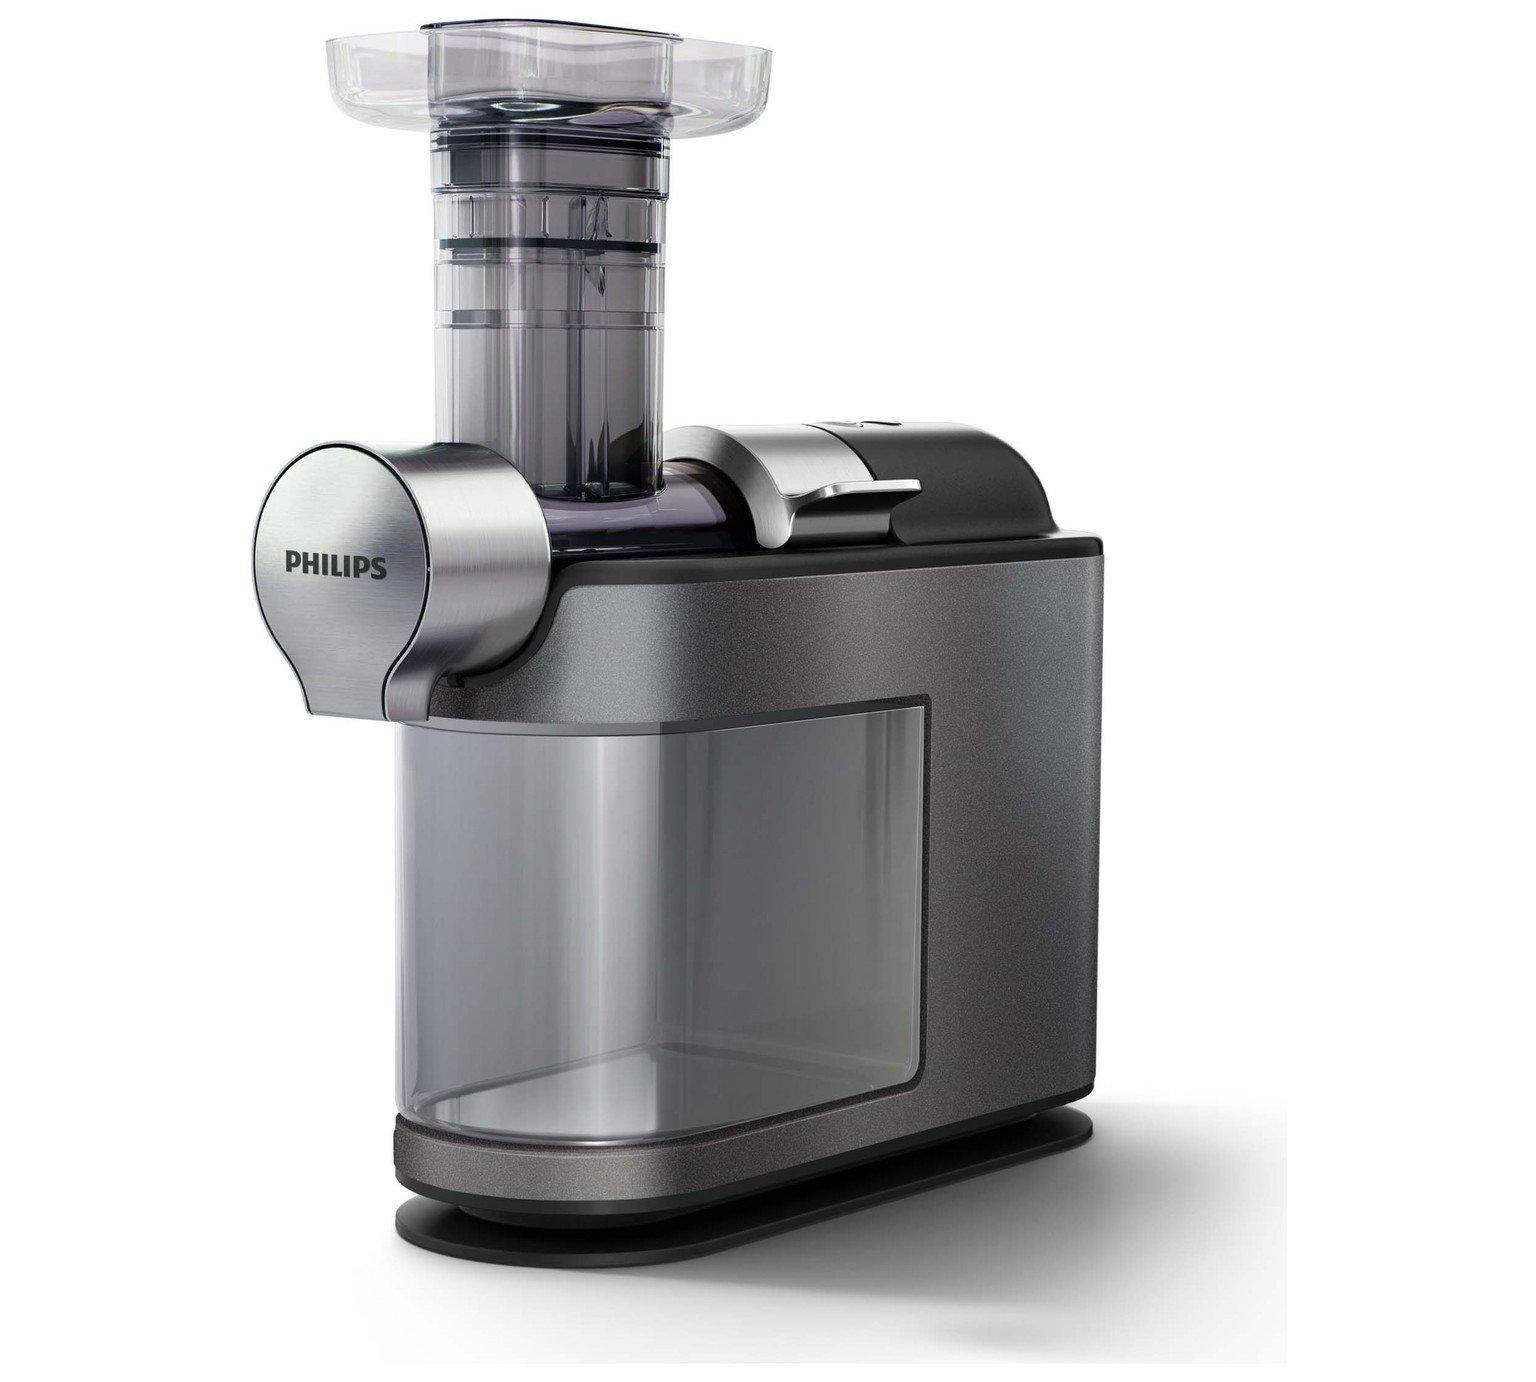 Philips HR1947 Avance Micro Masticating Slow Juicer